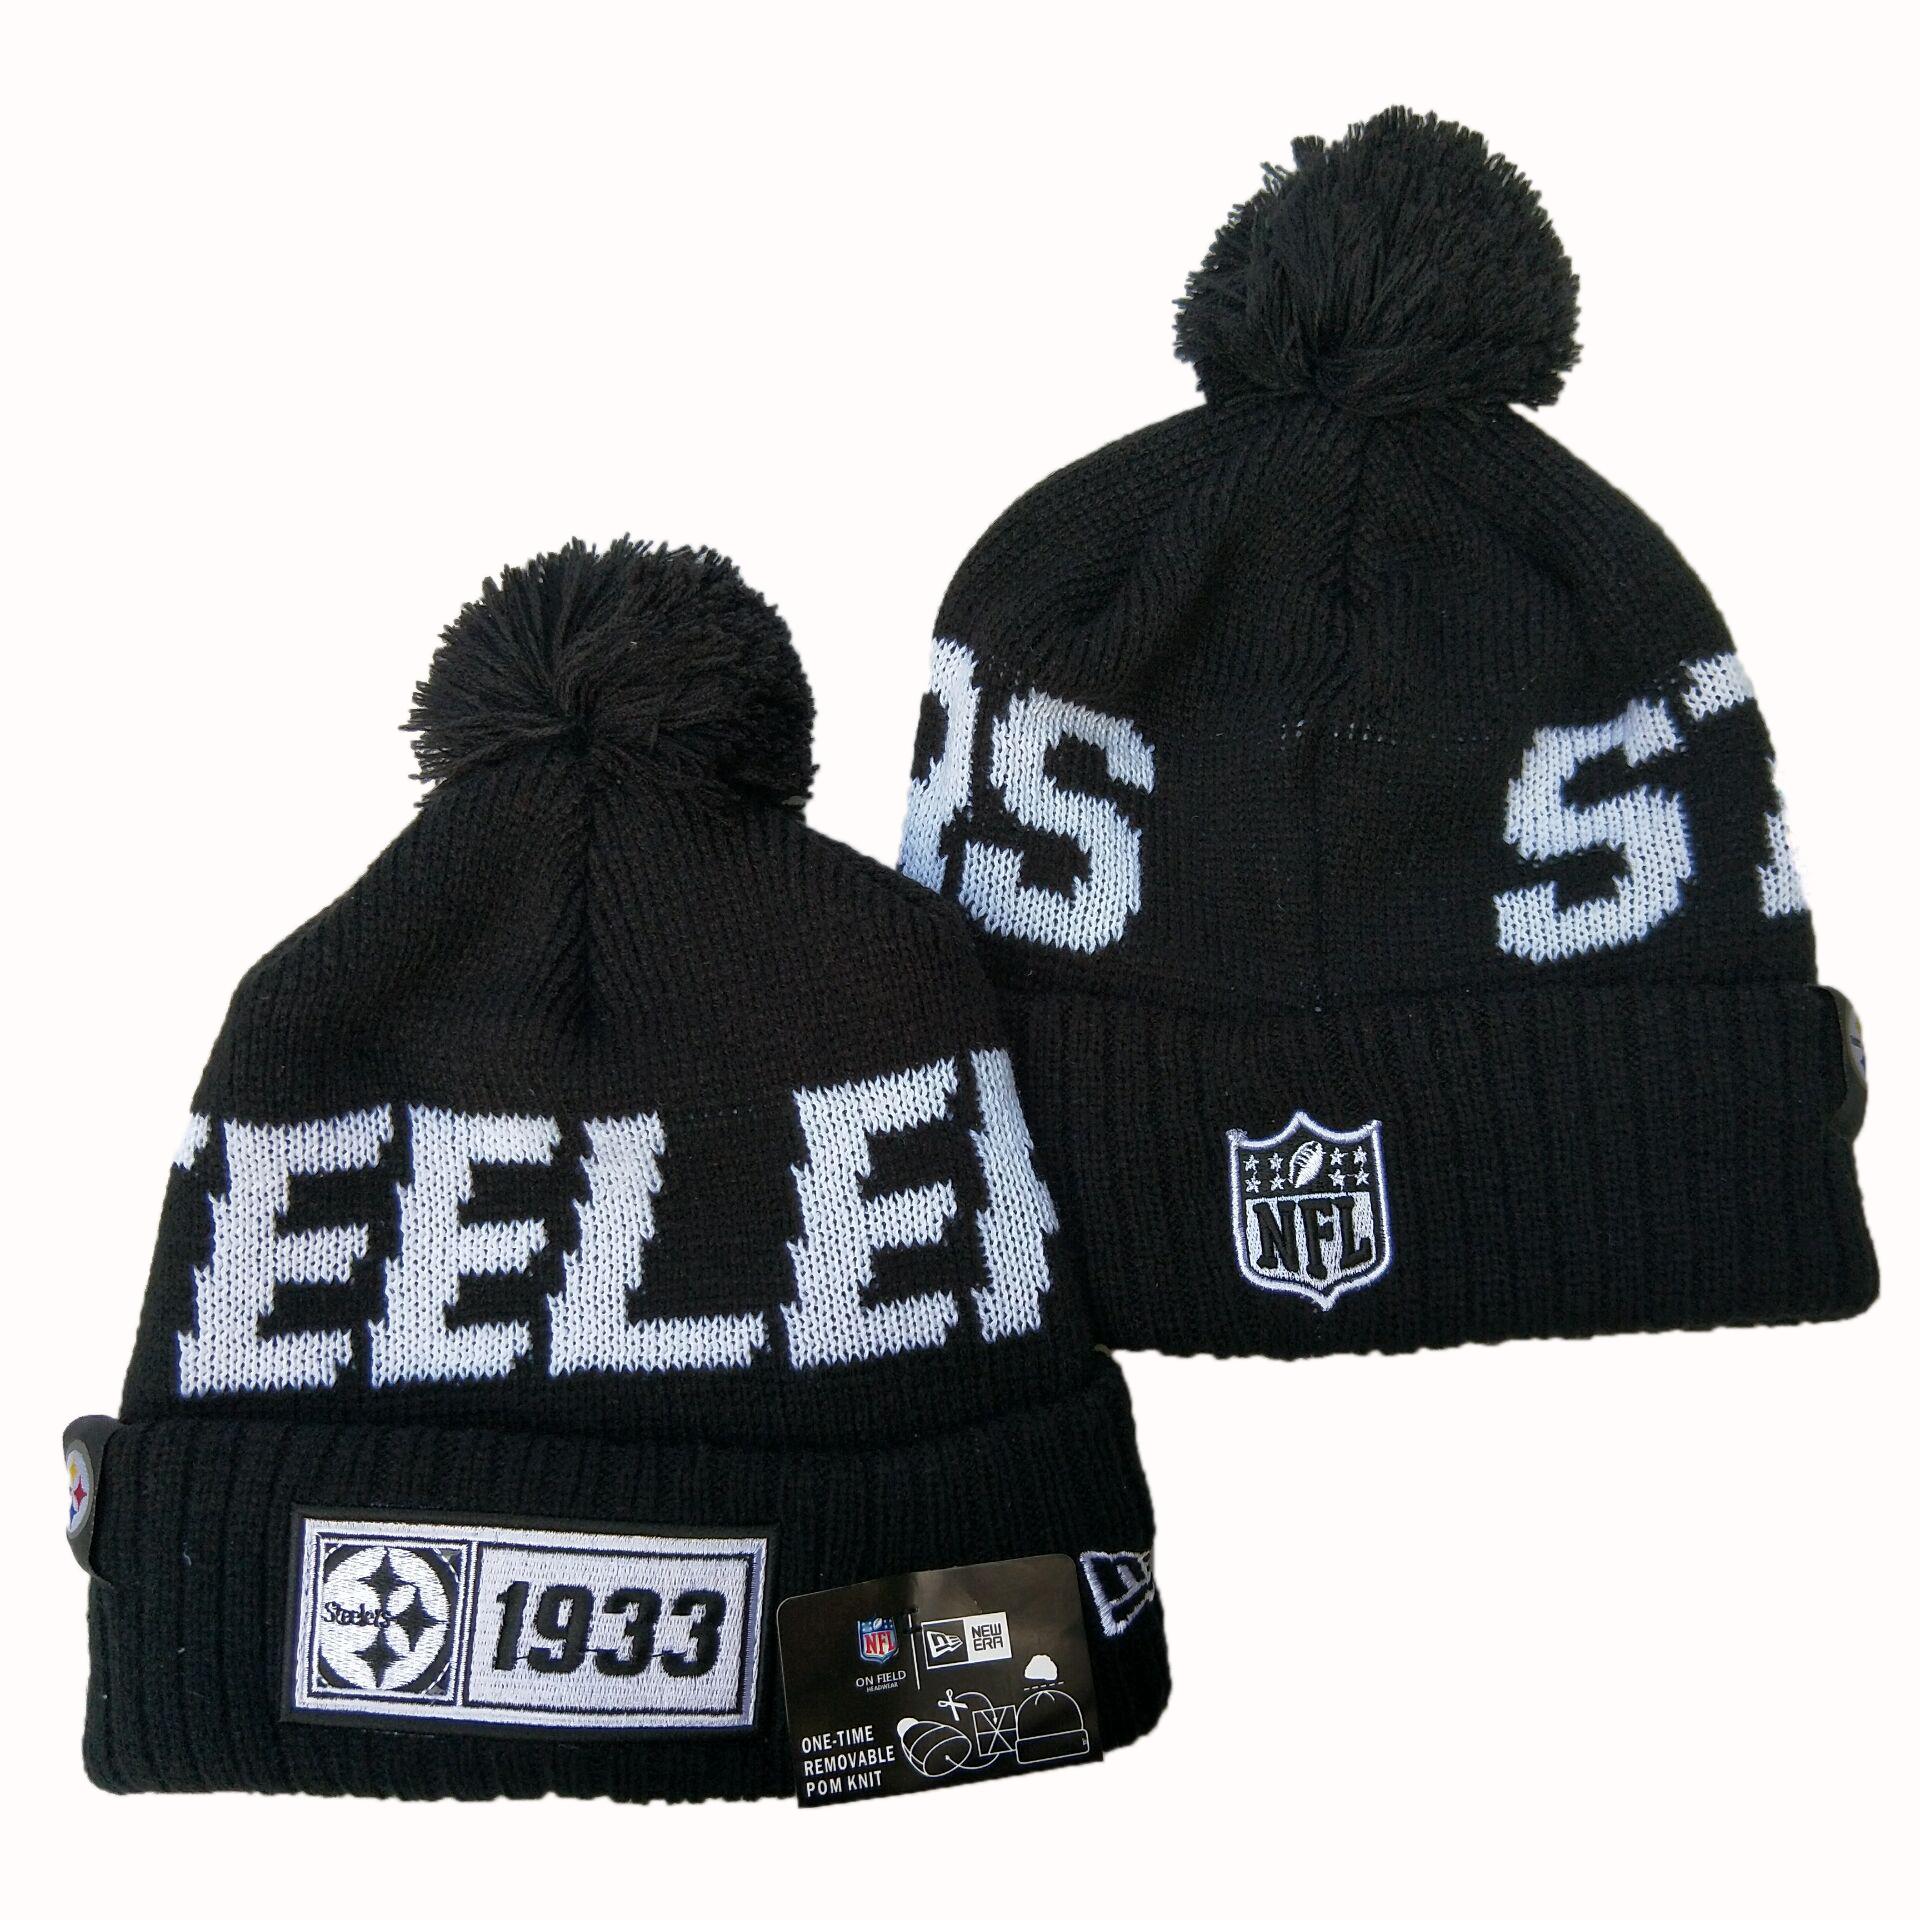 Steelers Team Logo Black Pom Knit Hat YD